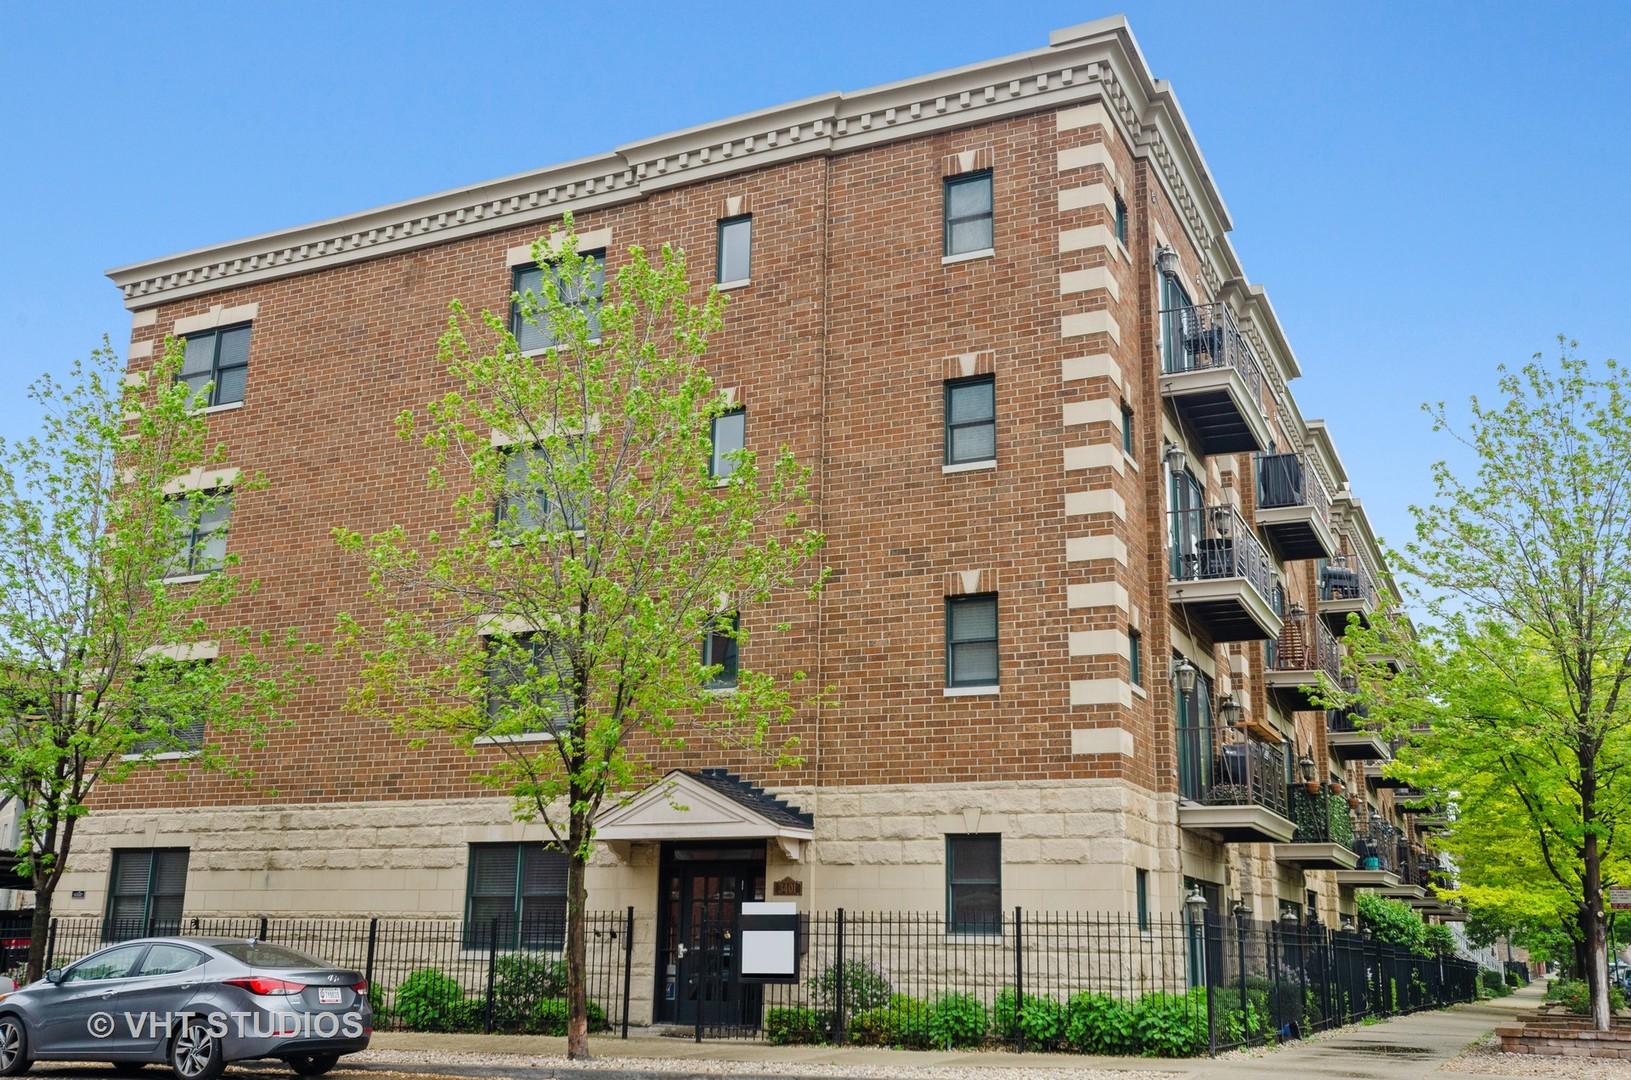 3401 Racine Unit Unit 1 ,Chicago, Illinois 60657